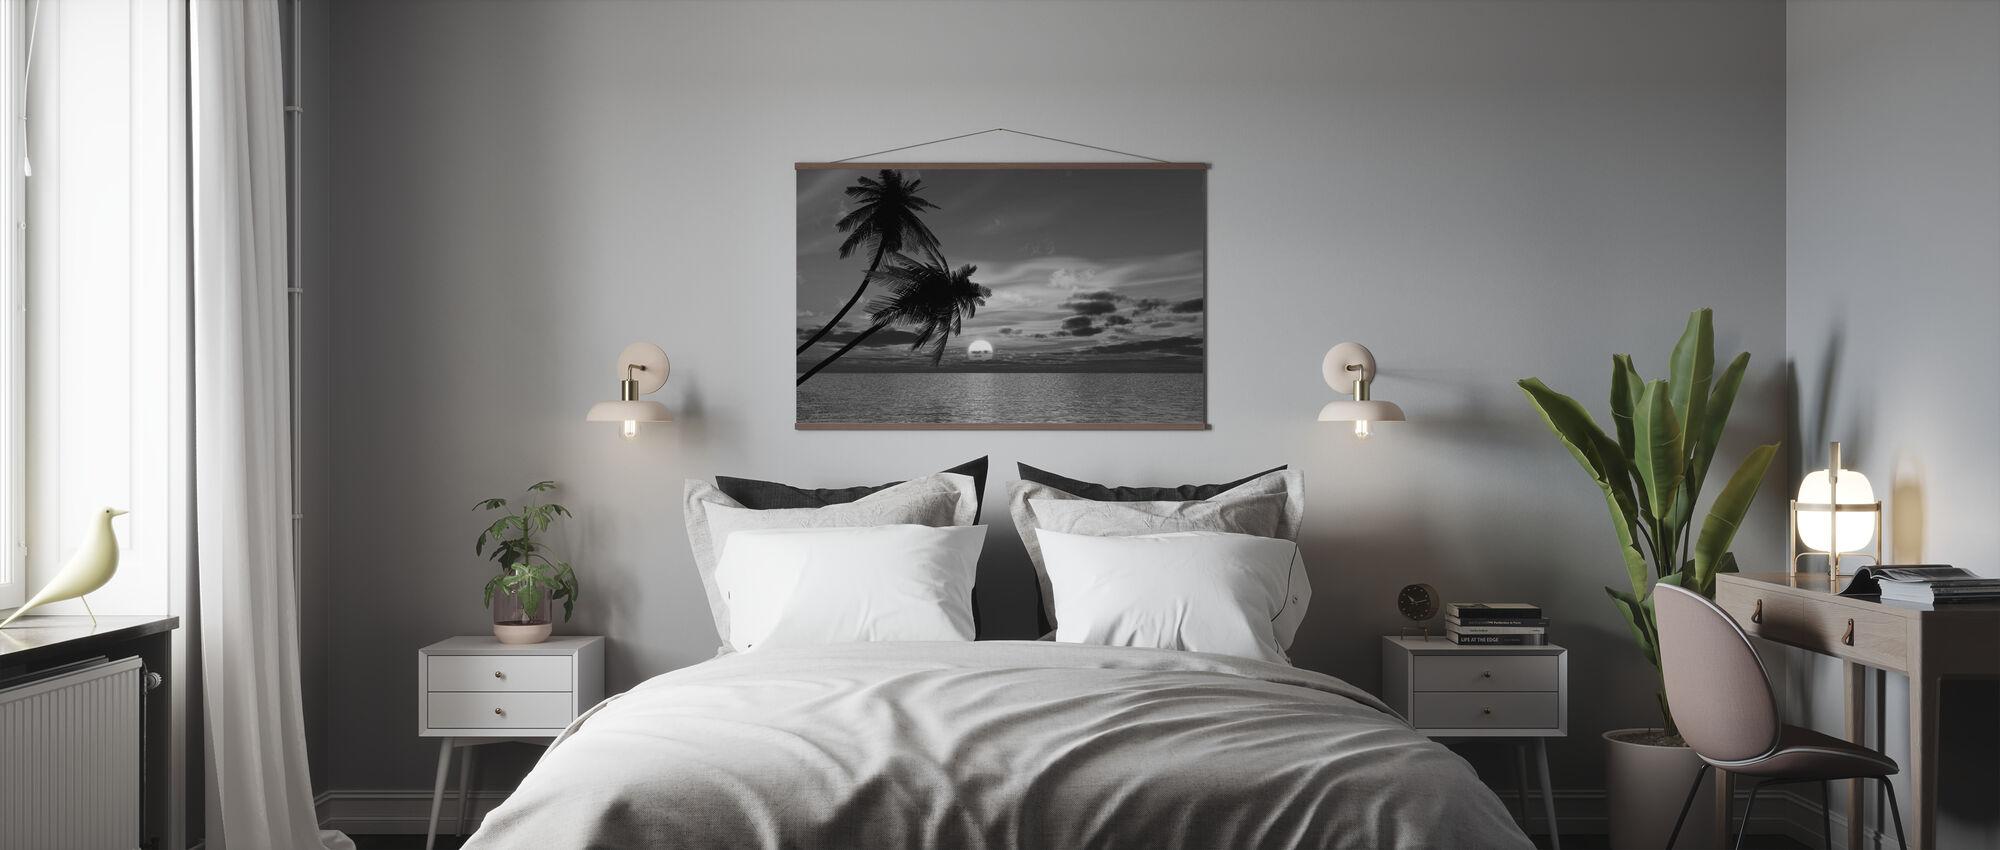 Kokosnoot Palm Zon - Poster - Slaapkamer